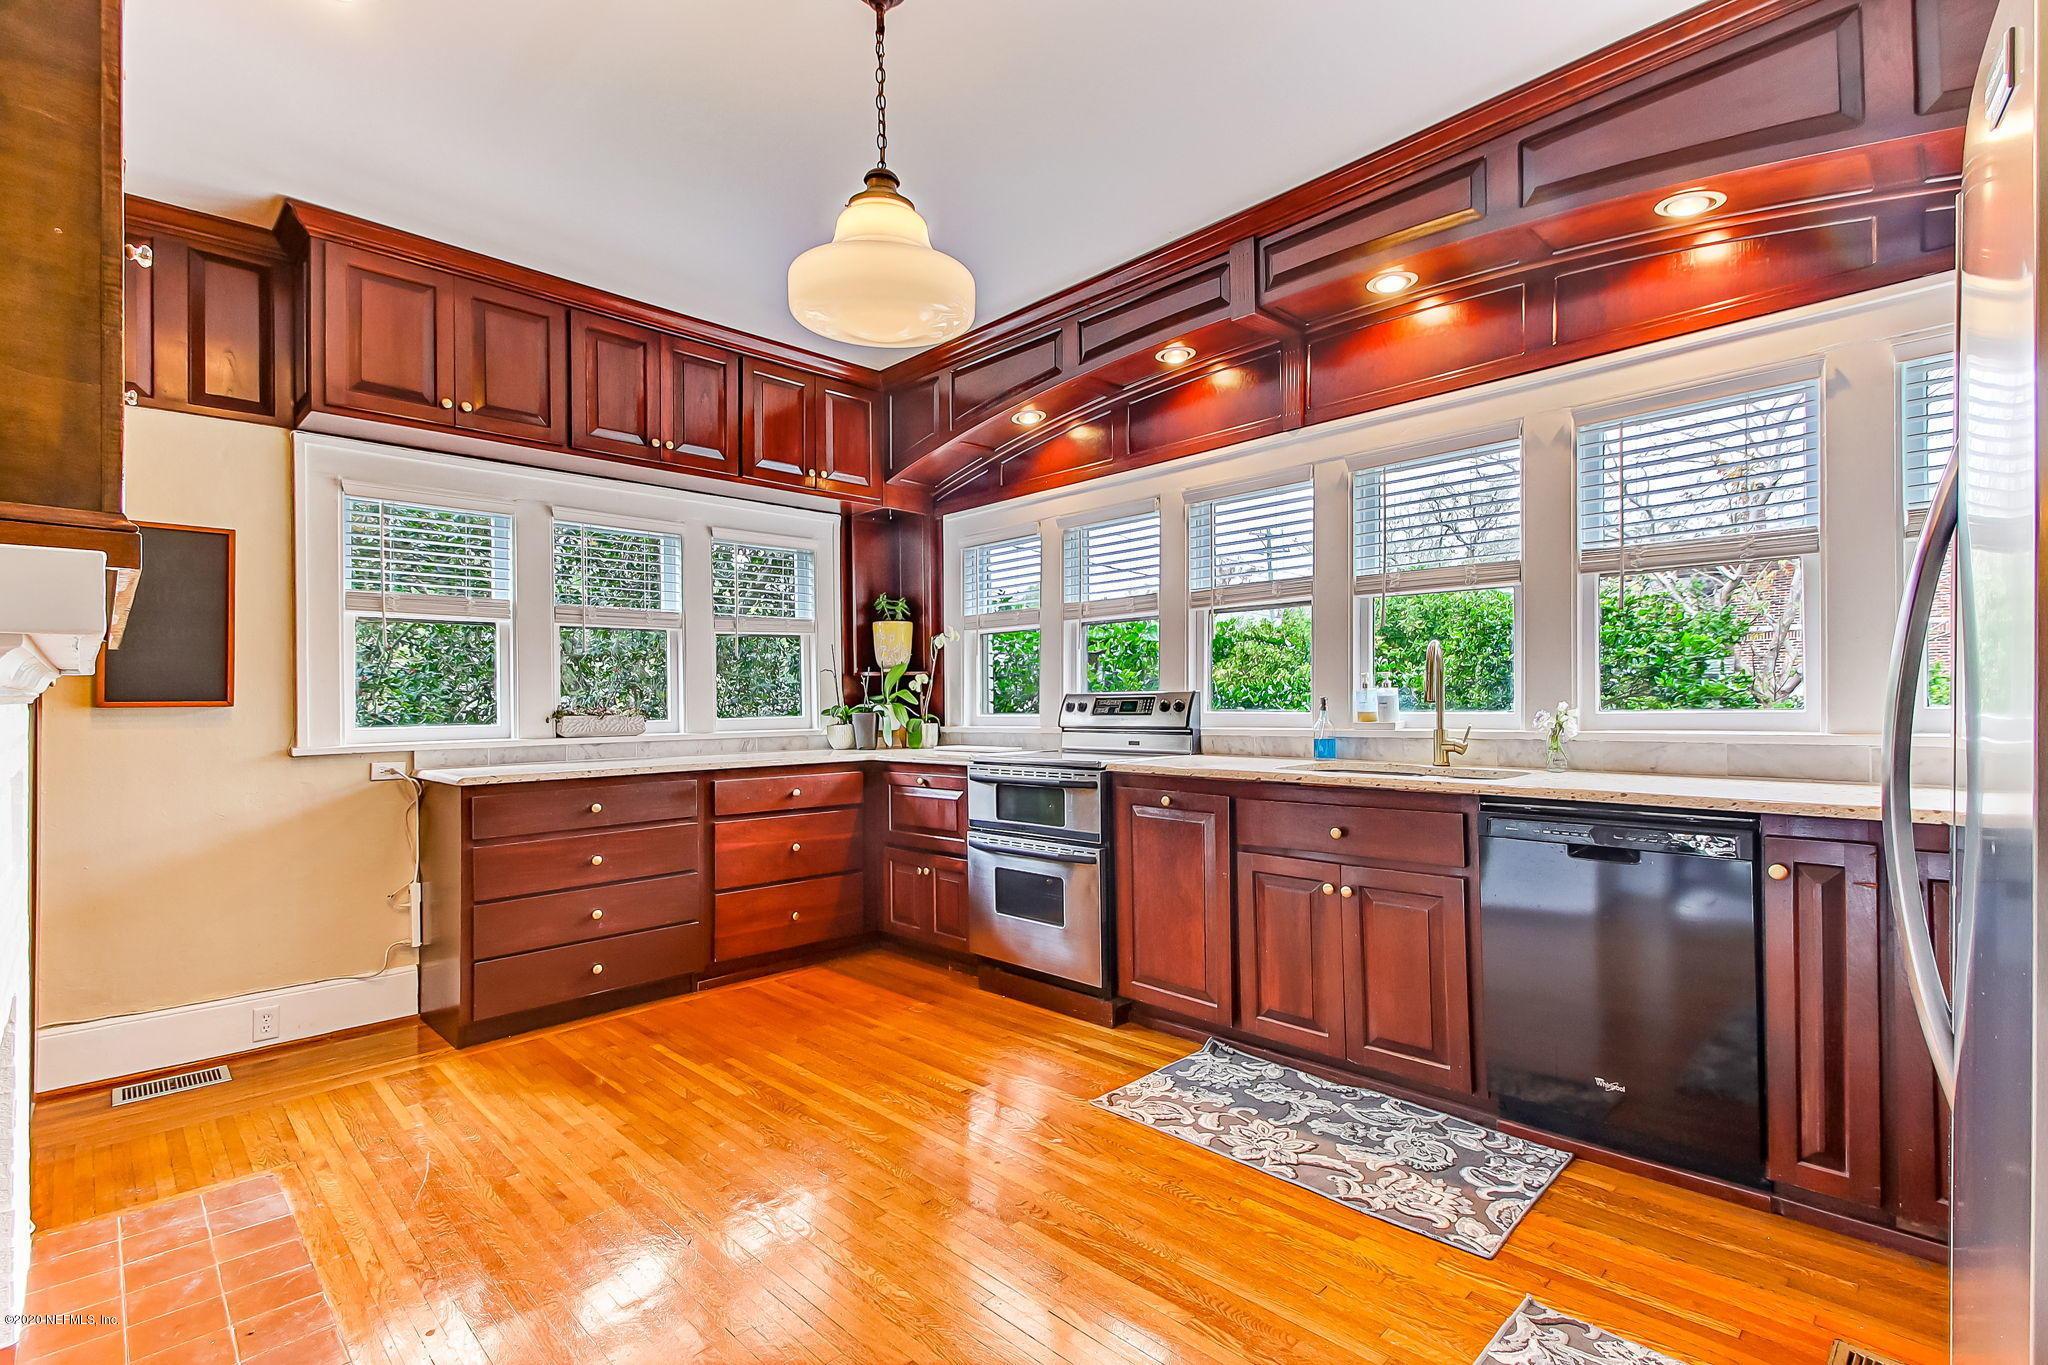 2263 ST JOHNS, JACKSONVILLE, FLORIDA 32204, 6 Bedrooms Bedrooms, ,3 BathroomsBathrooms,Residential,For sale,ST JOHNS,1036223